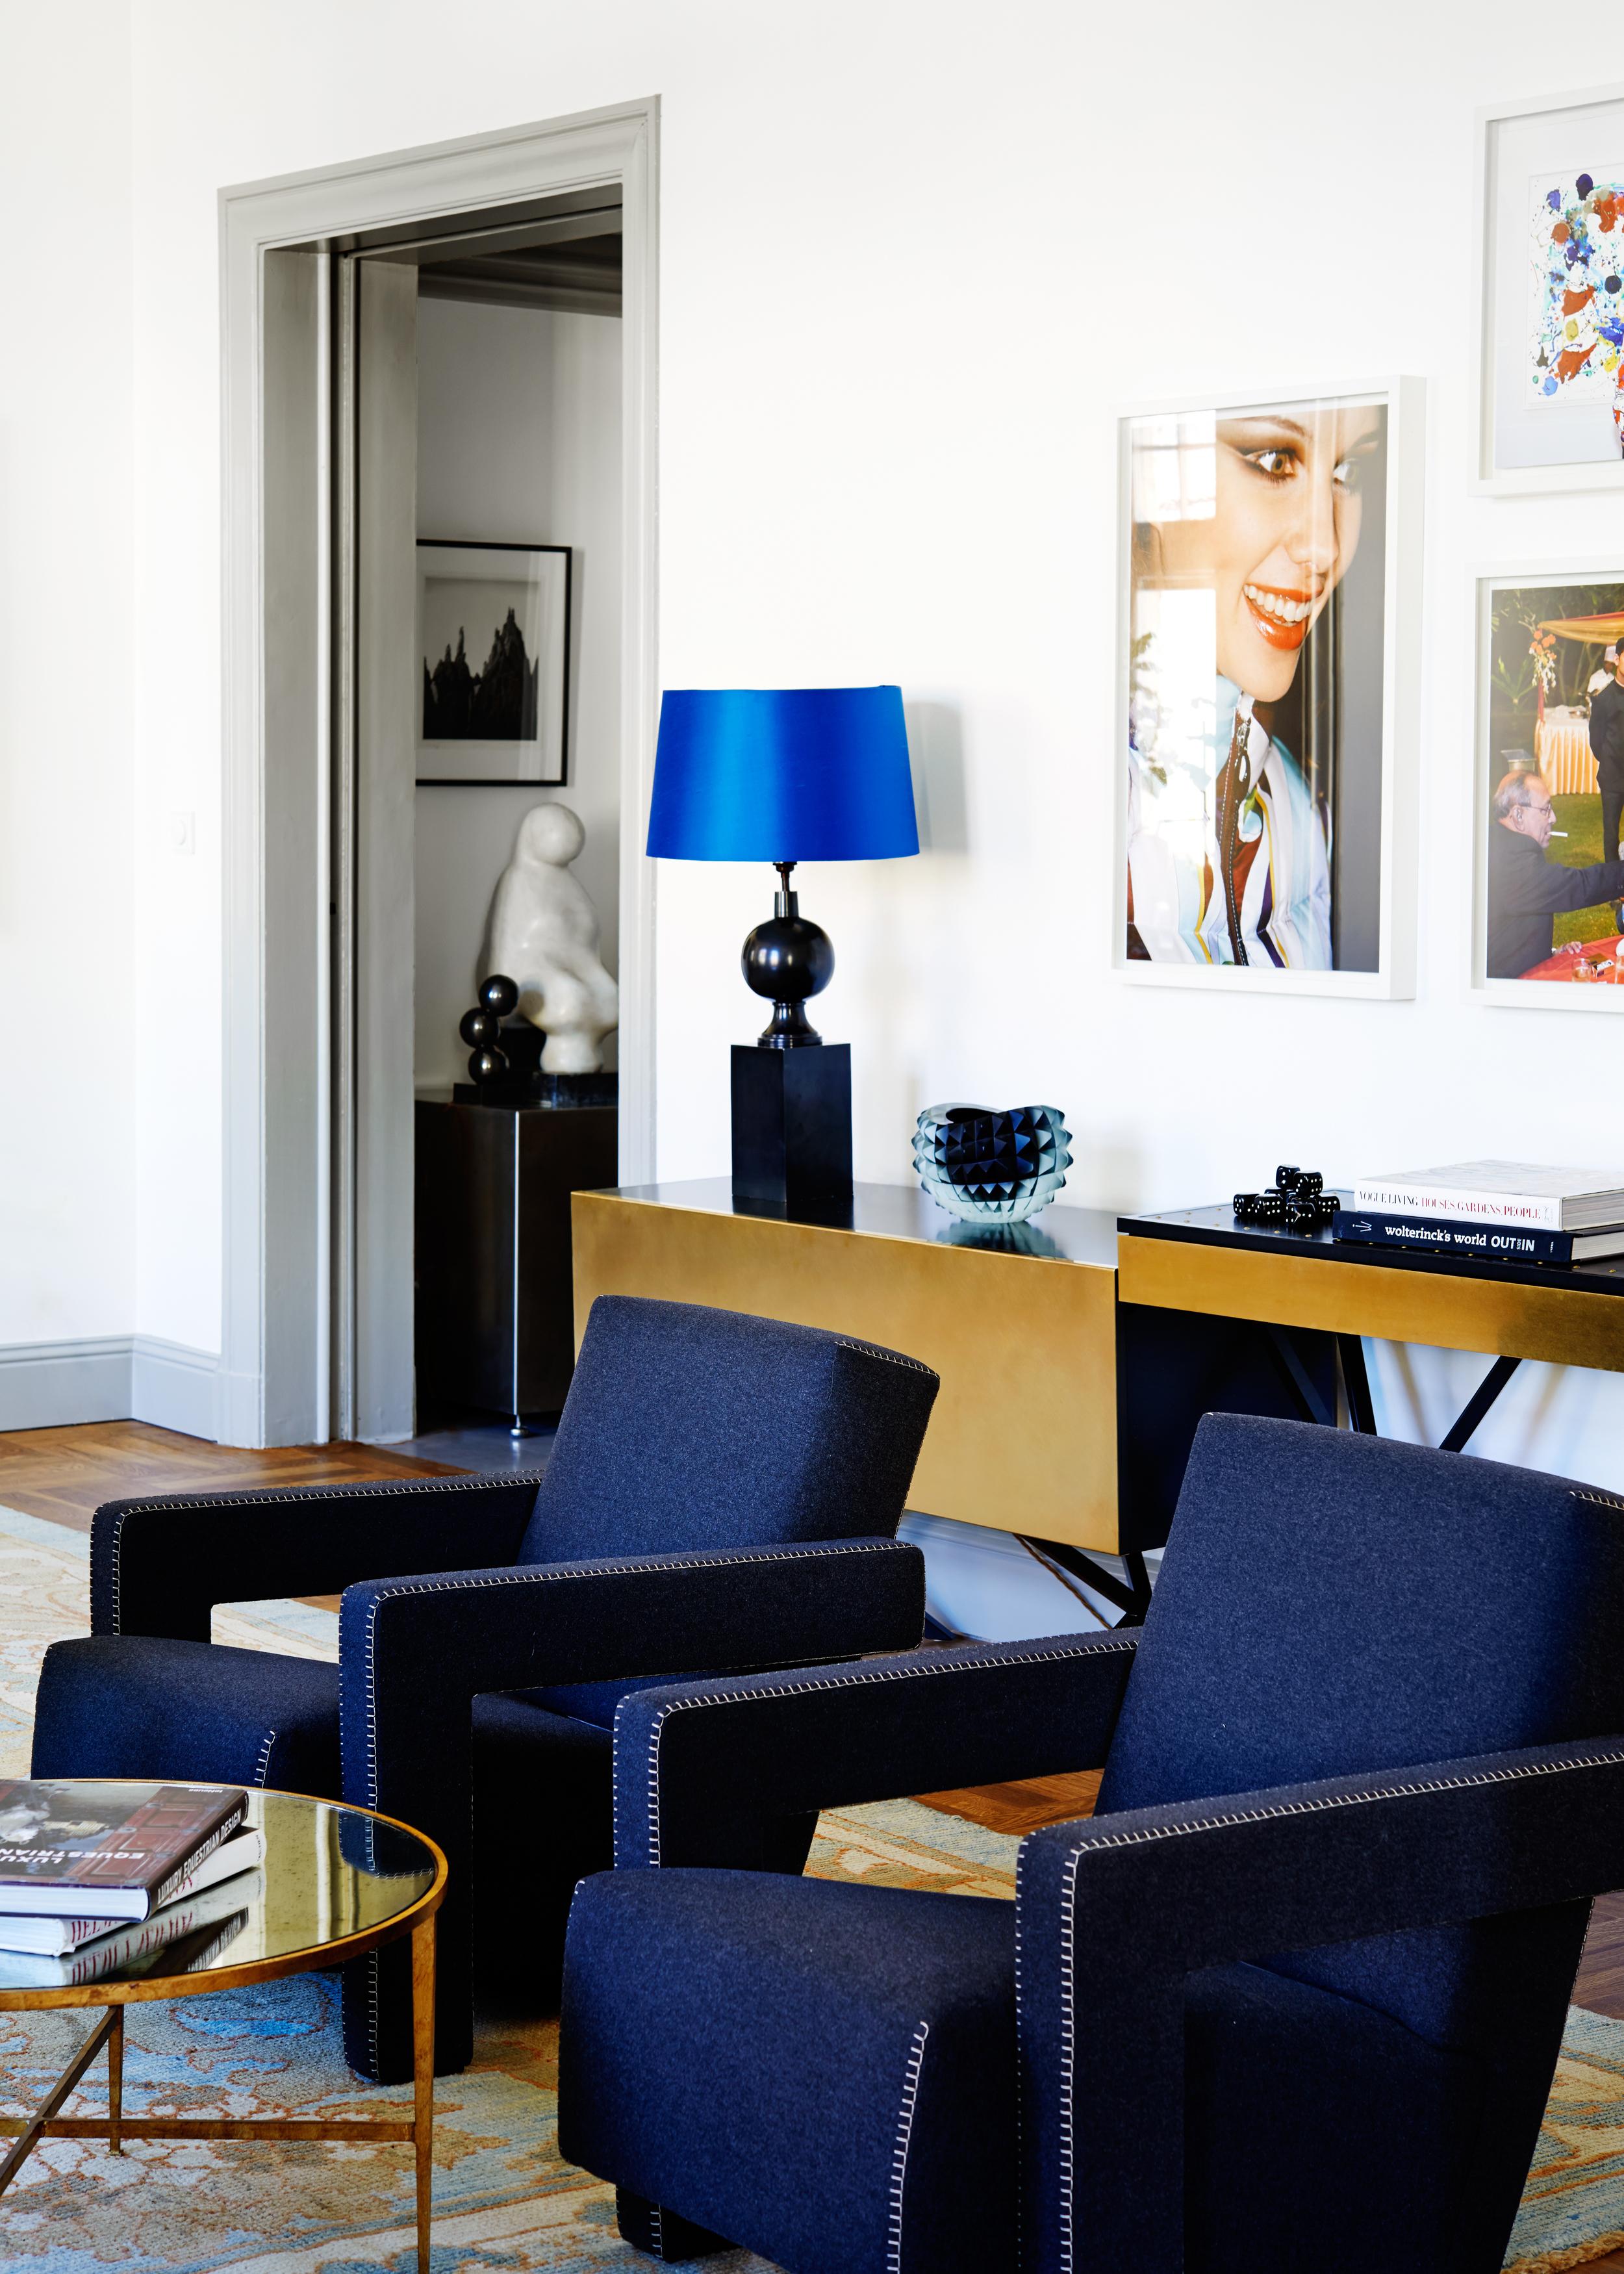 Martin Parr - Fr. serien Luxury